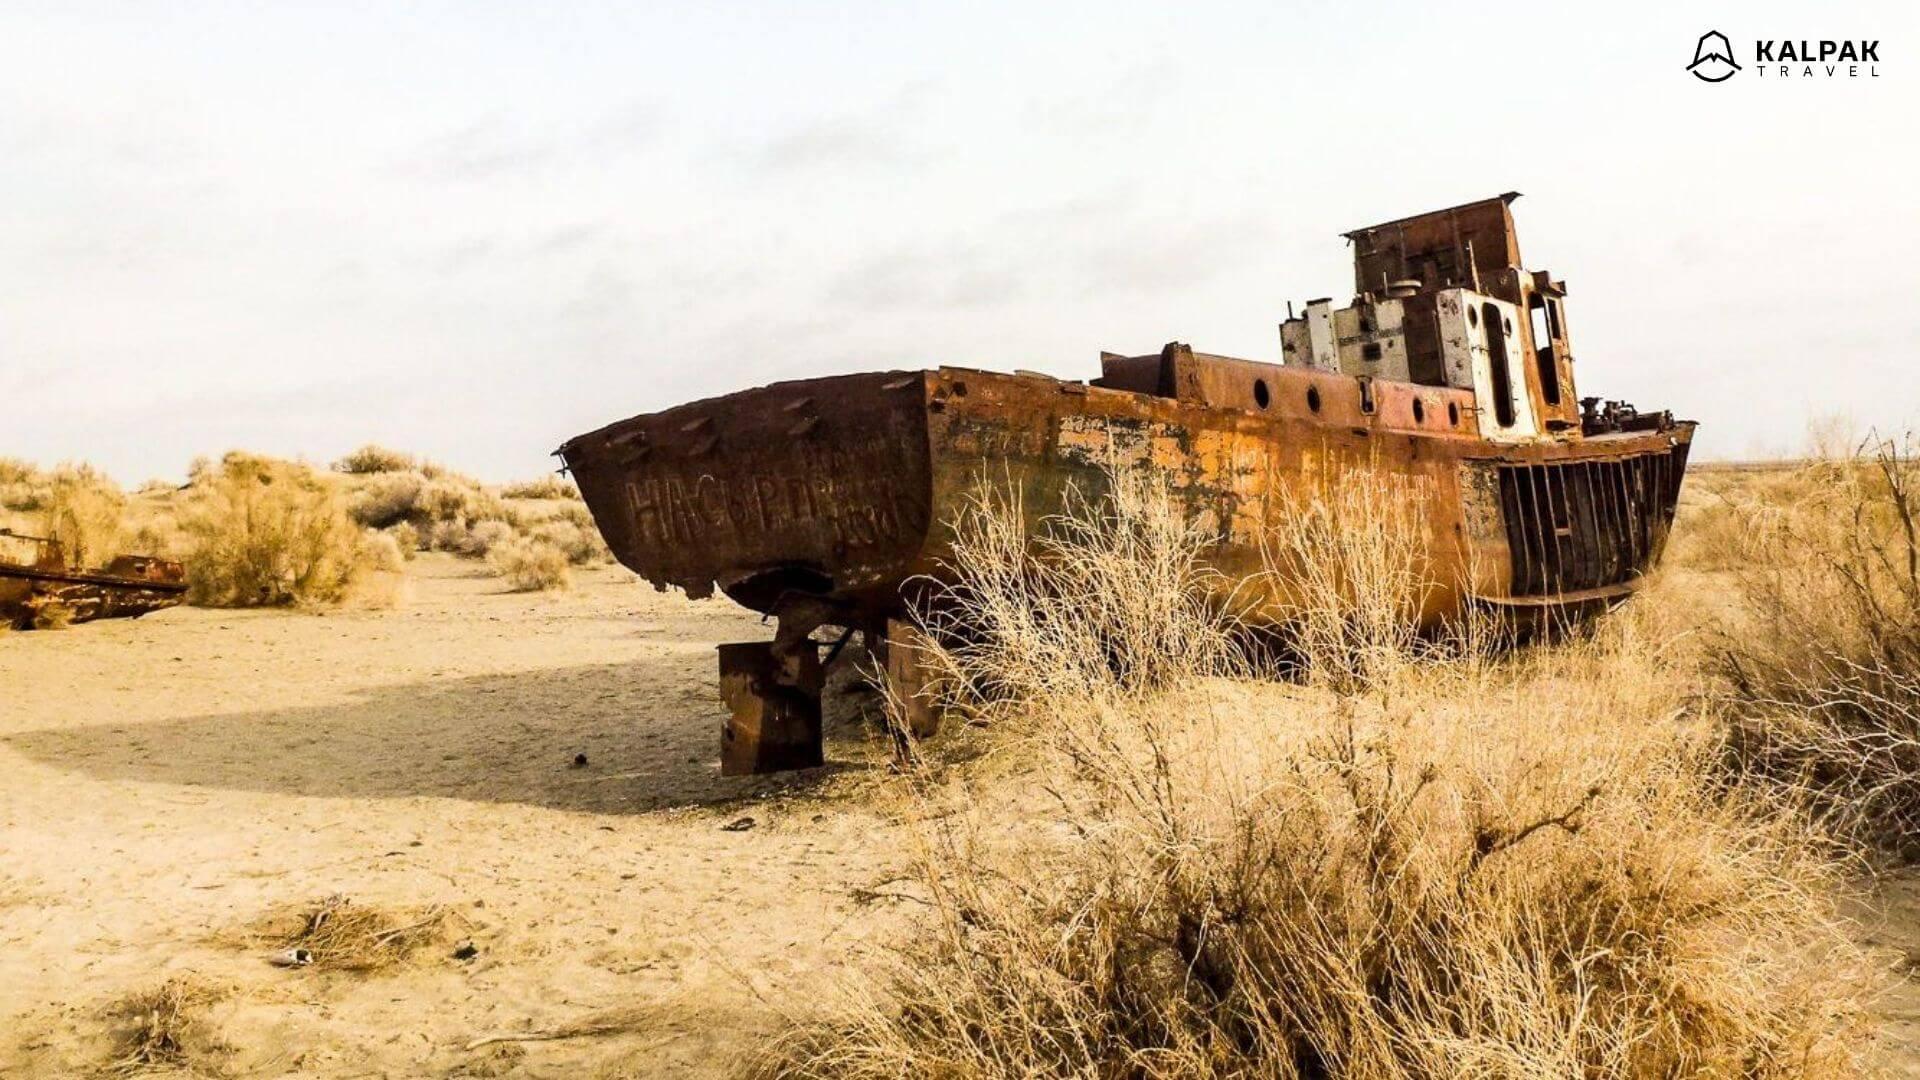 Aral Sea ship on sand in Uzbekistan